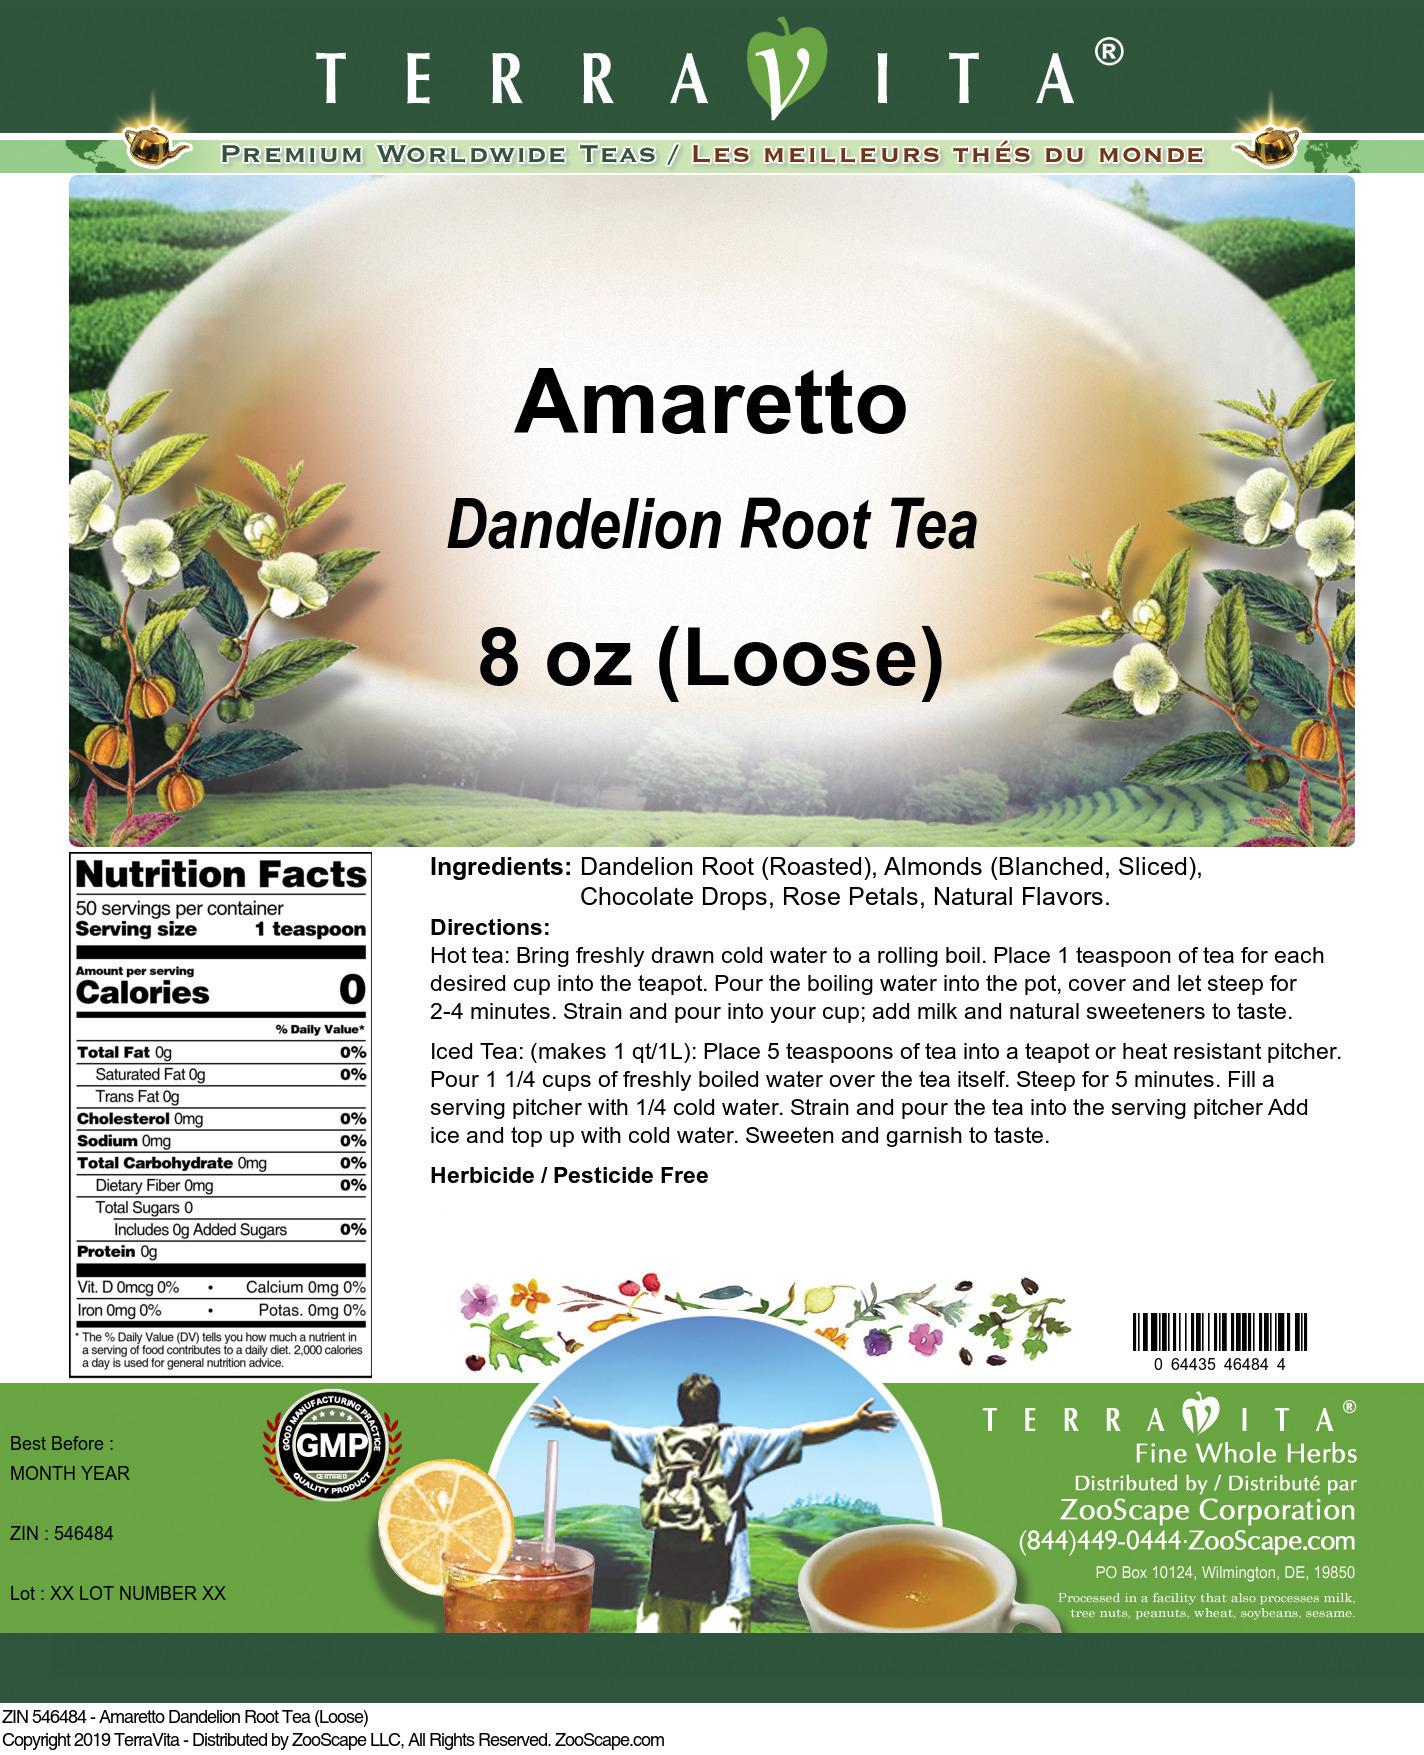 Amaretto Dandelion Root Tea (Loose)